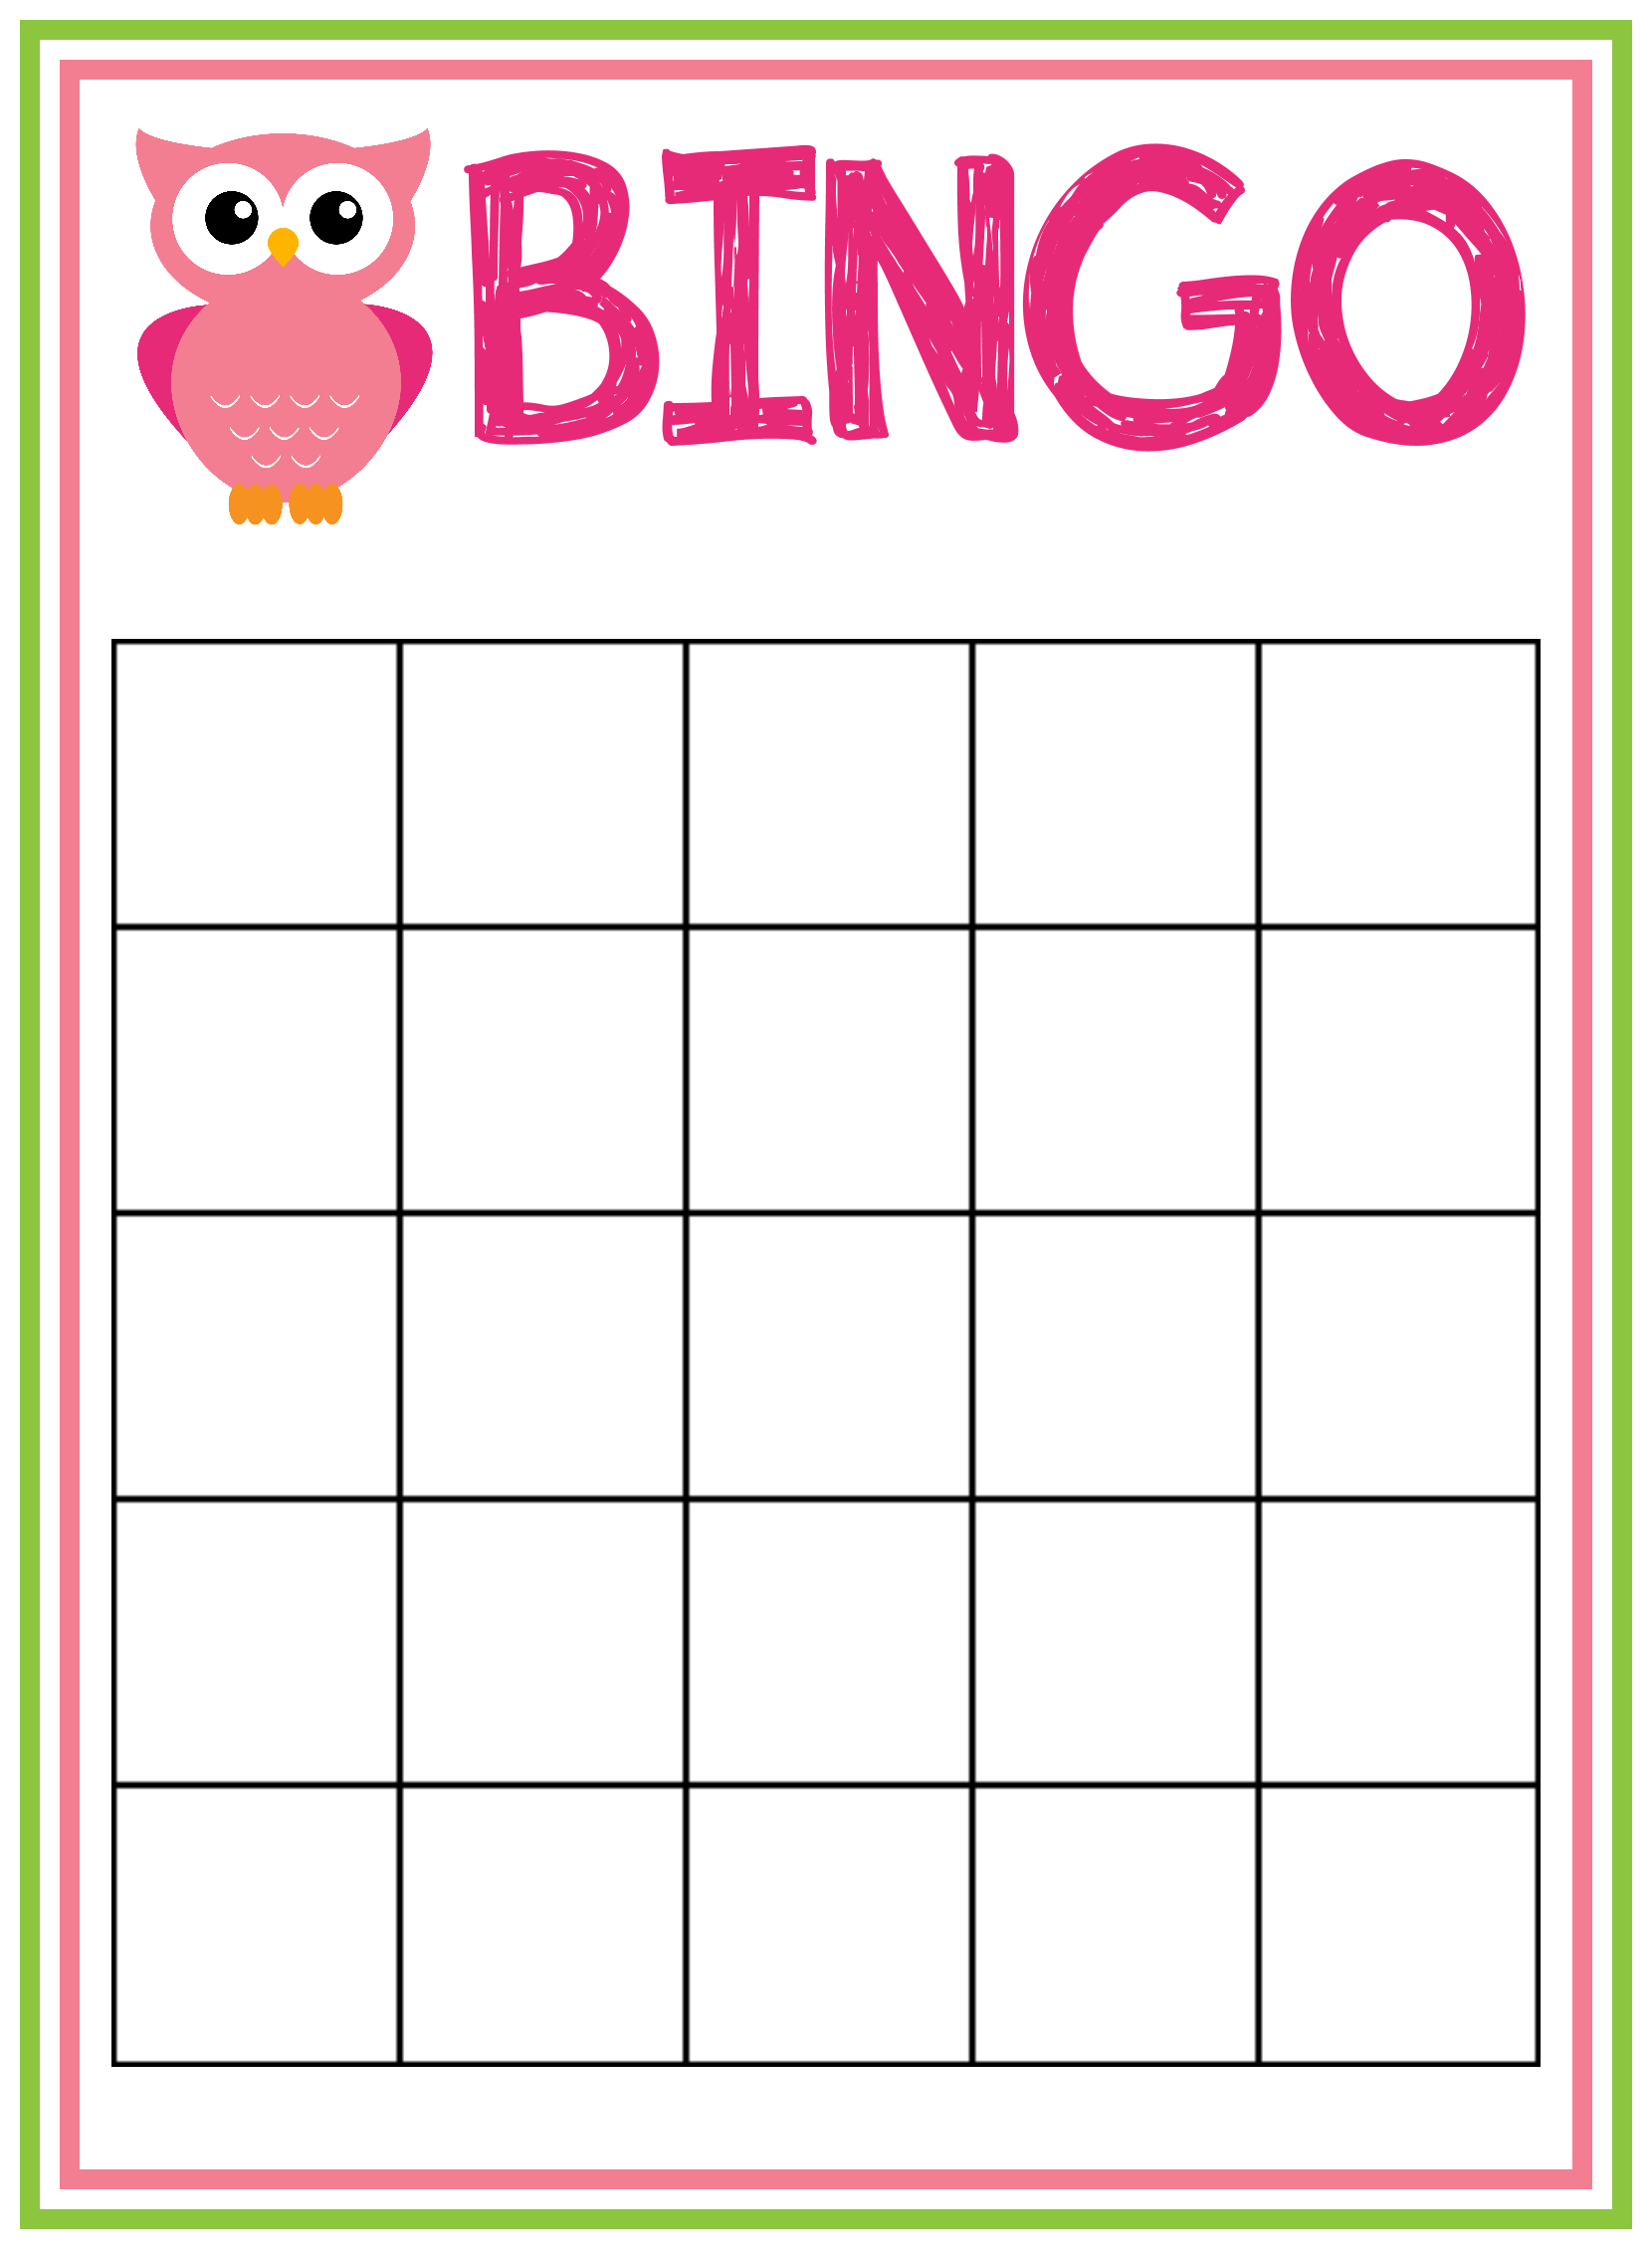 Free Printable Owl Baby Shower Invitations {& Other Printables - Baby Bingo Free Printable Template